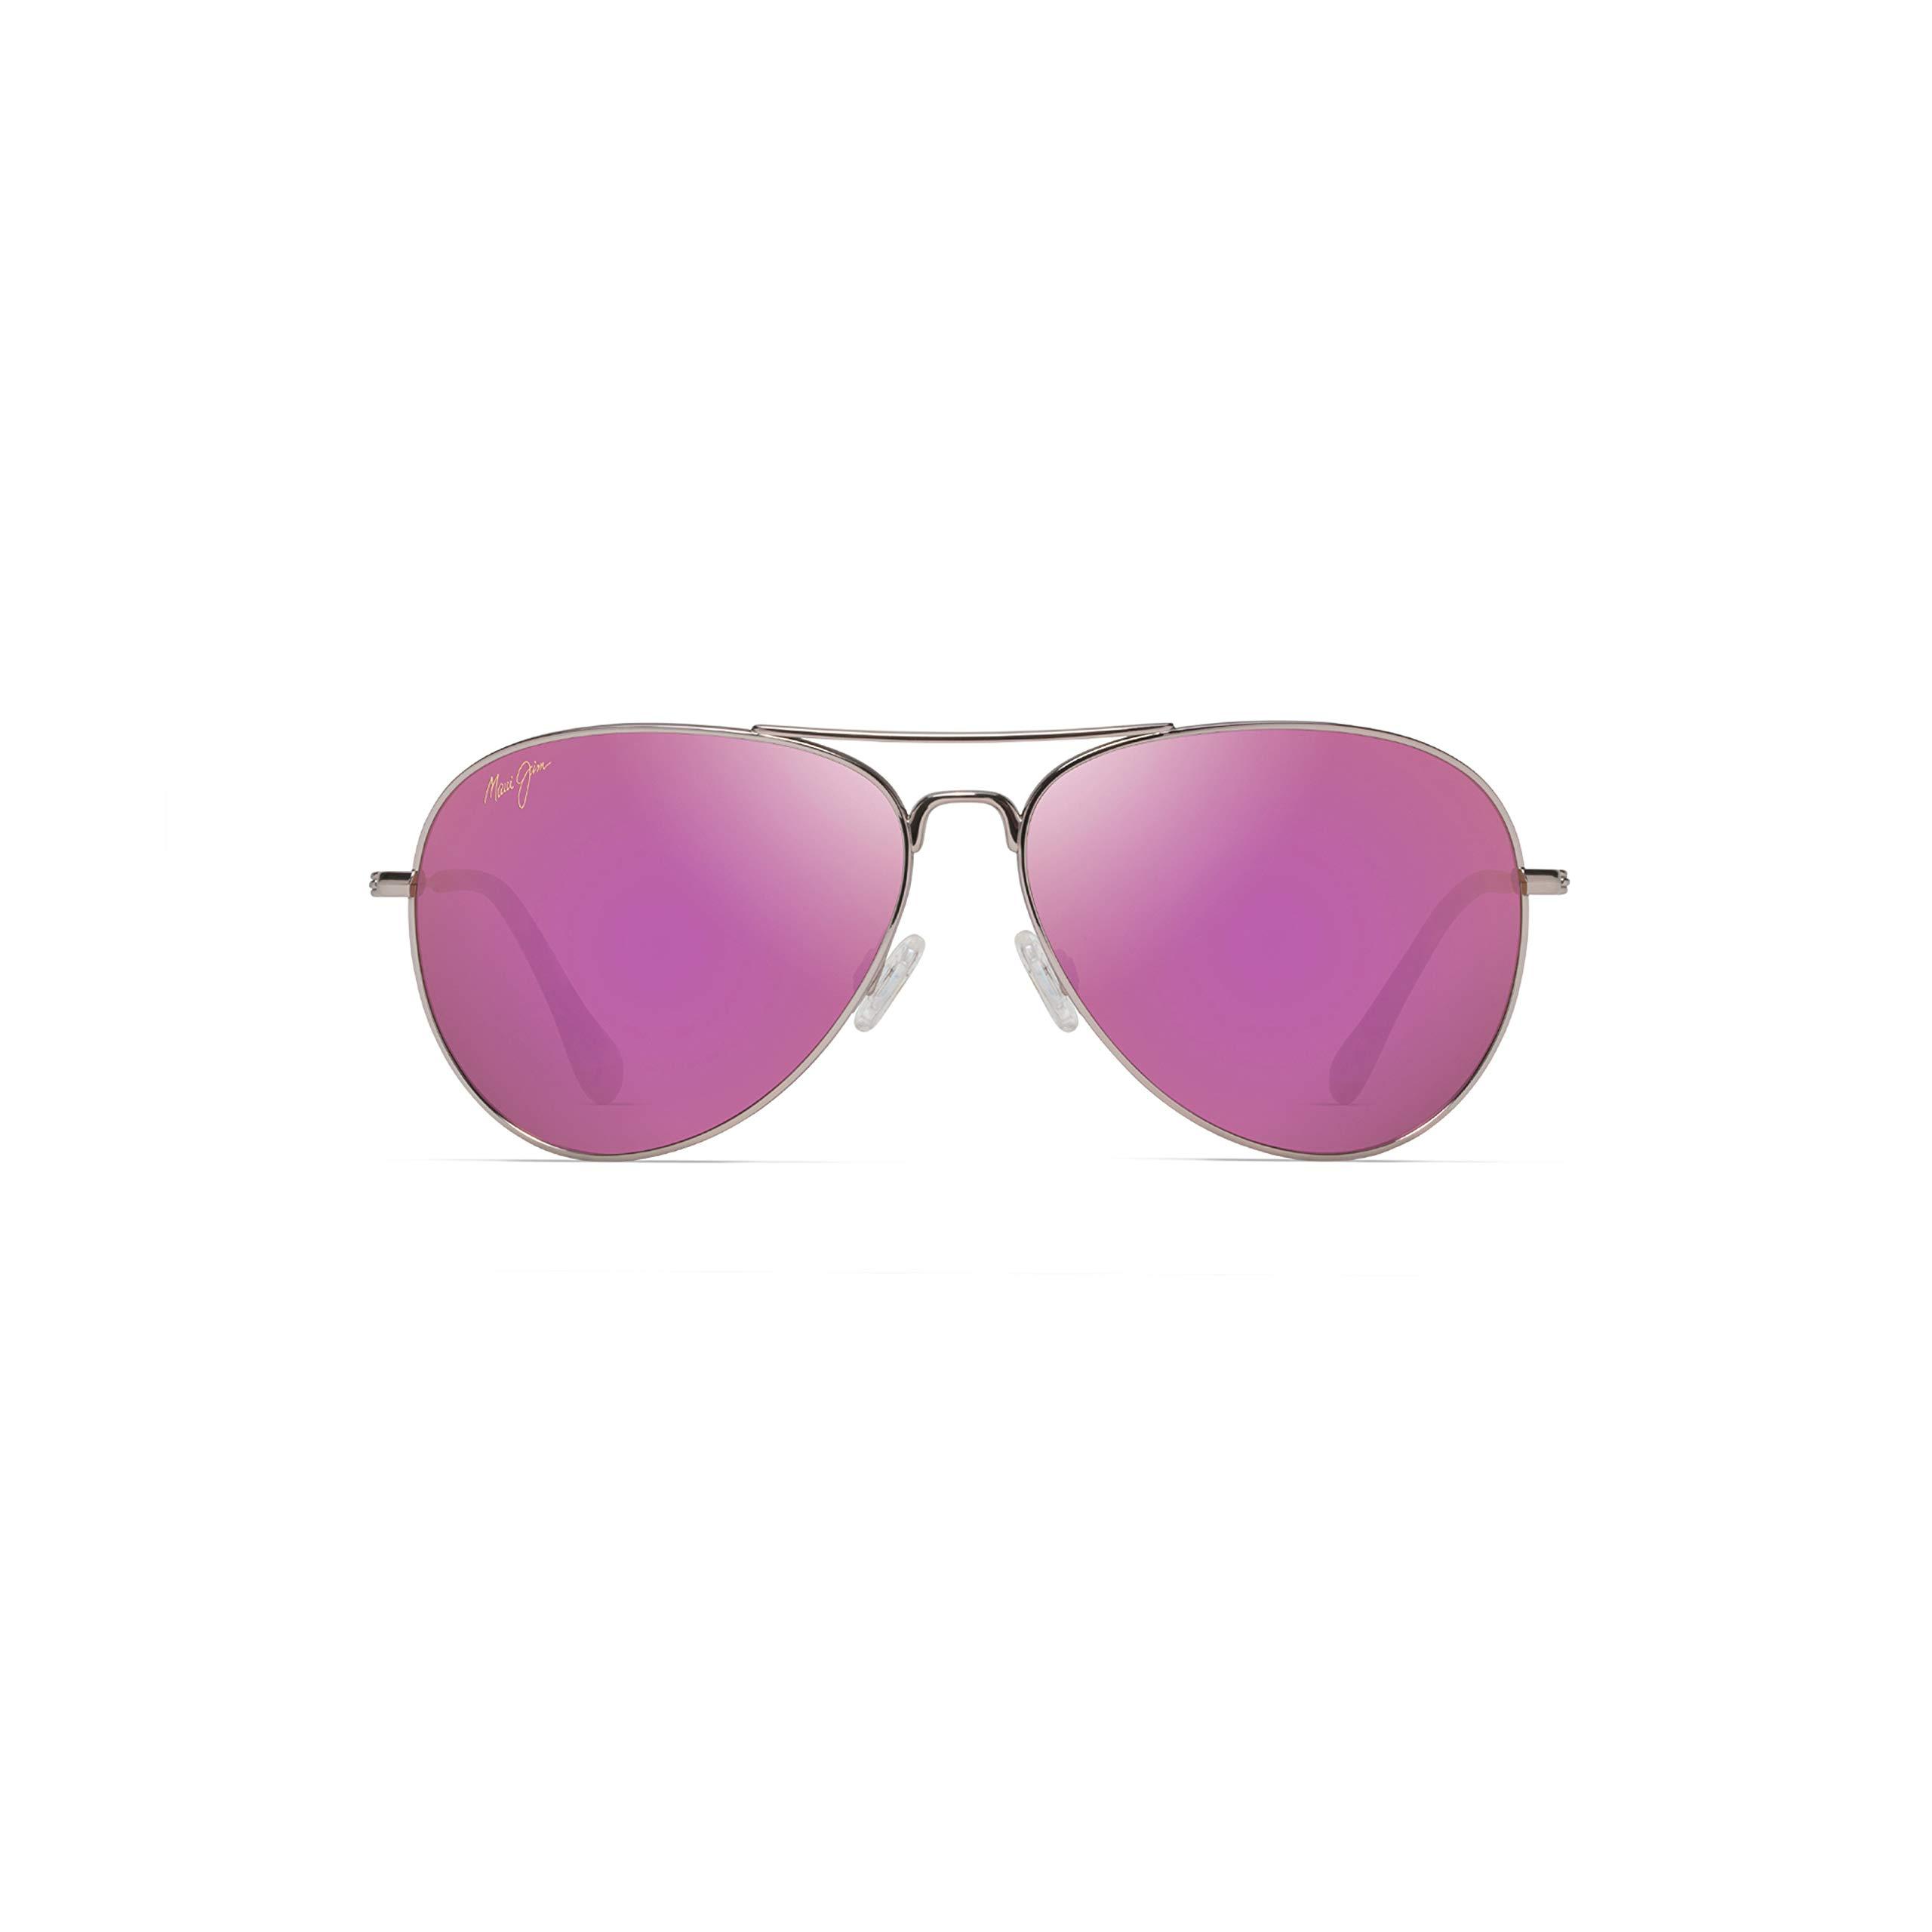 ویکالا · خرید  اصل اورجینال · خرید از آمازون · Maui Jim Sunglasses | Mavericks 264 | Aviator Frame, Polarized Lenses, with Patented PolarizedPlus2 Lens Technology Rose Gold wekala · ویکالا